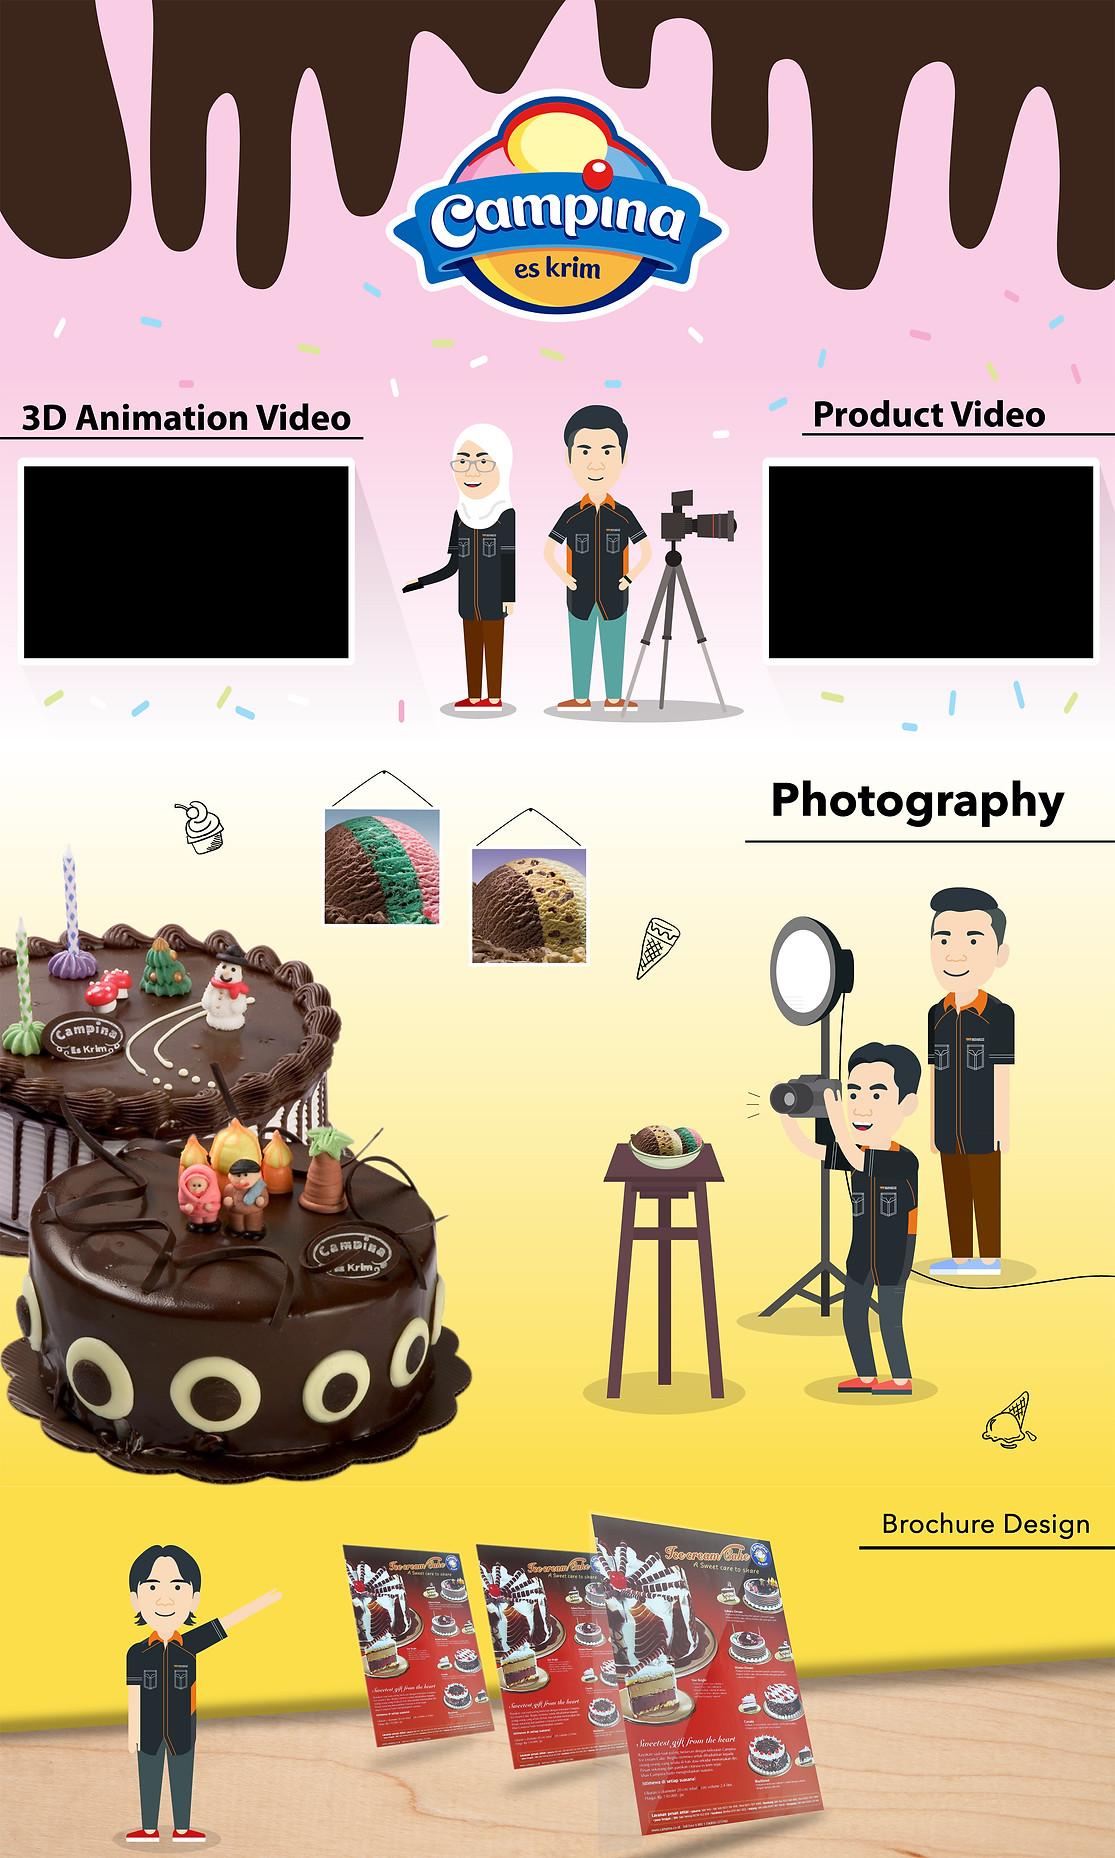 Jasa Pembuatan Video Promosi, Jasa Fotografi Surabaya